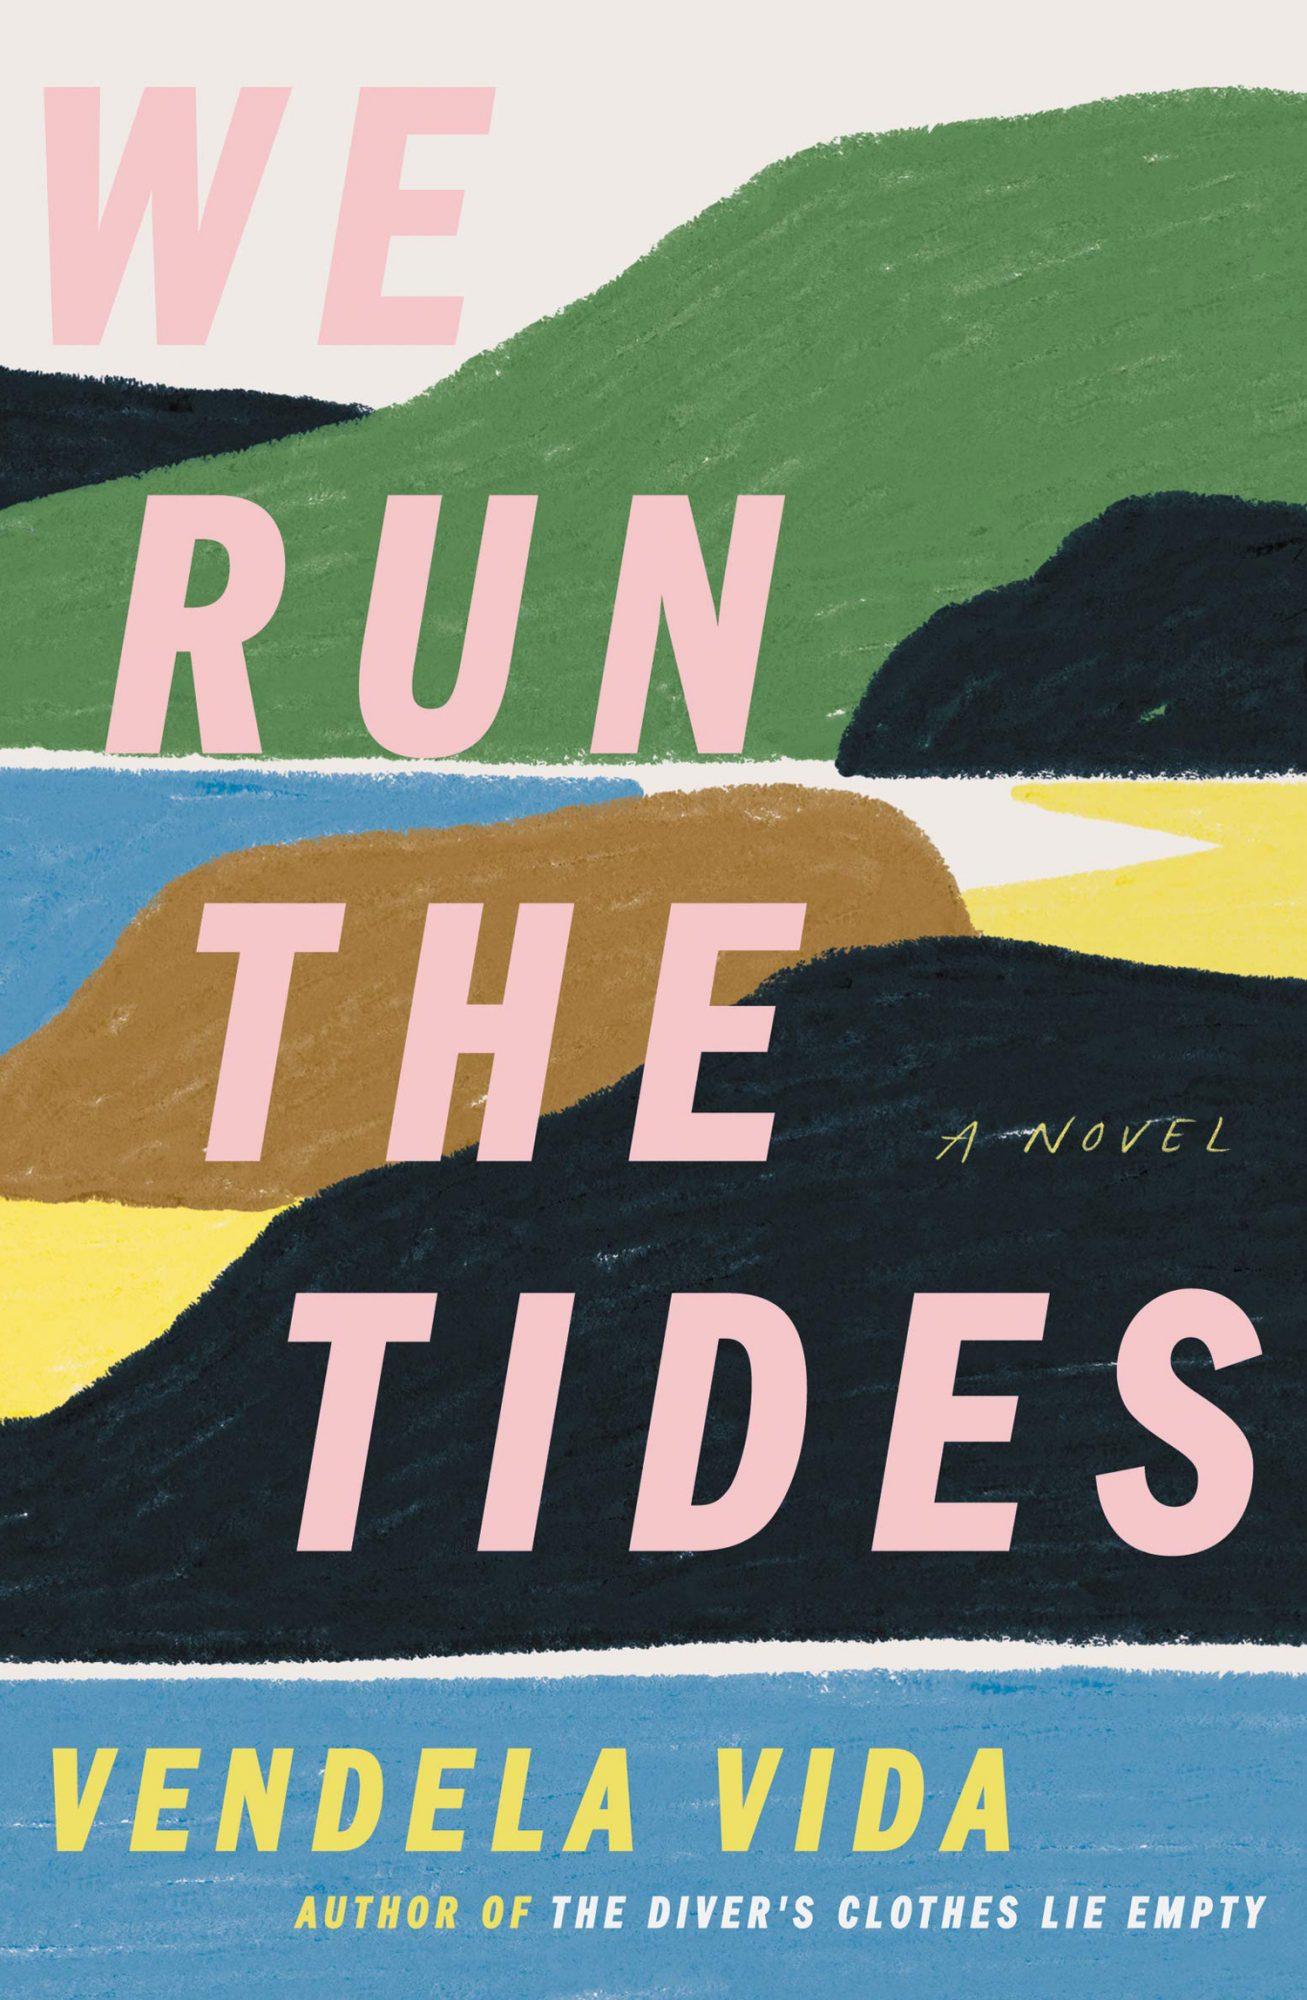 We Run the Tides: A Novel Hardcover by Vendela Vida